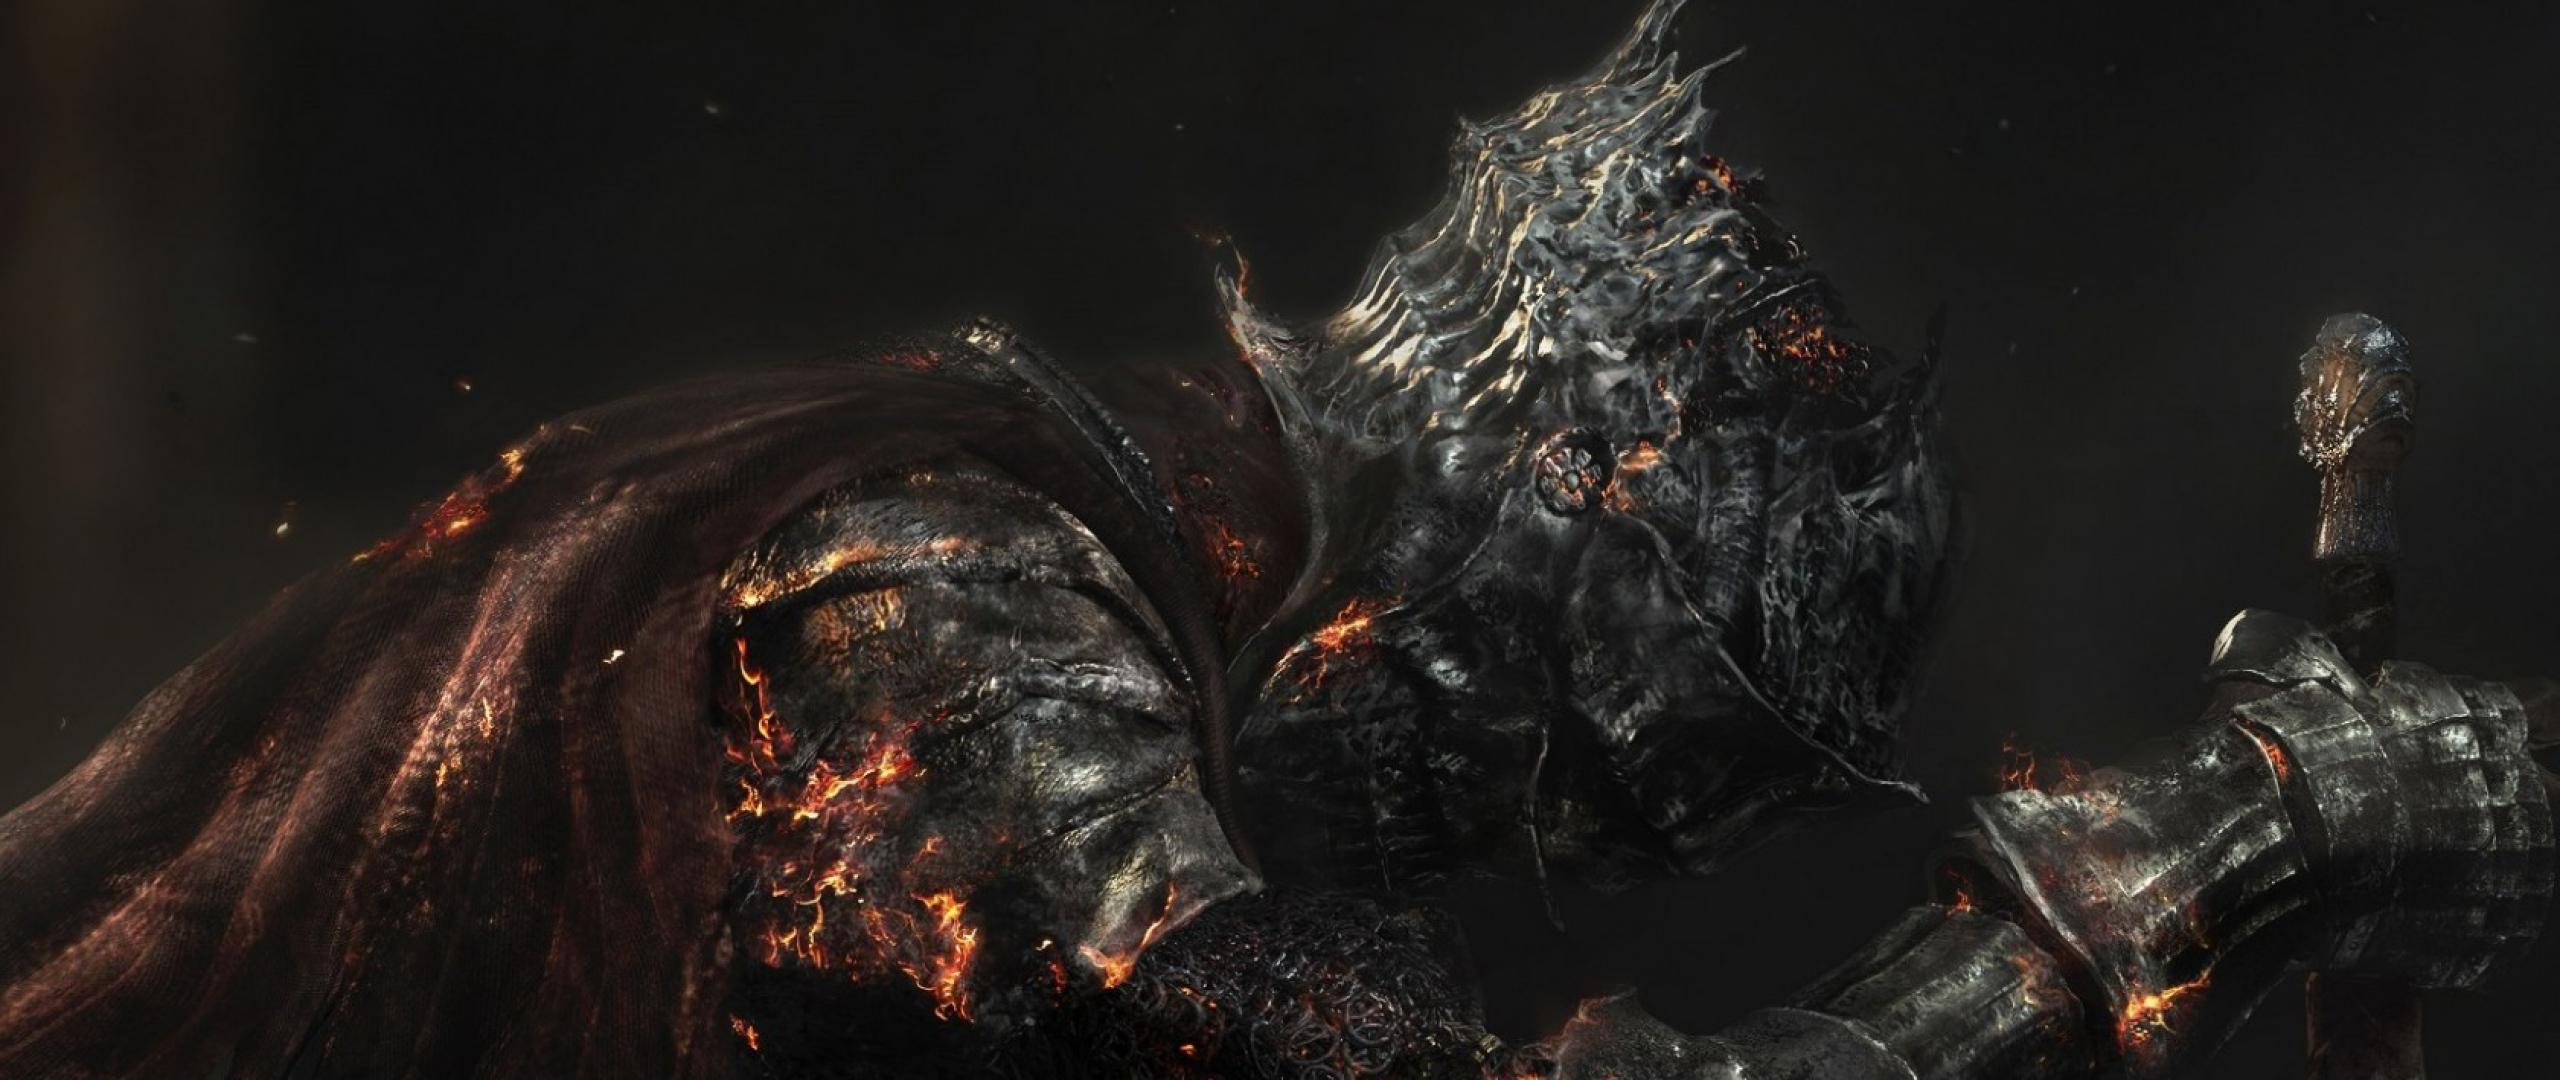 Dark Souls 3 iii Dark Souls 3 Armor Burning Skeleton Sword 2560x1080